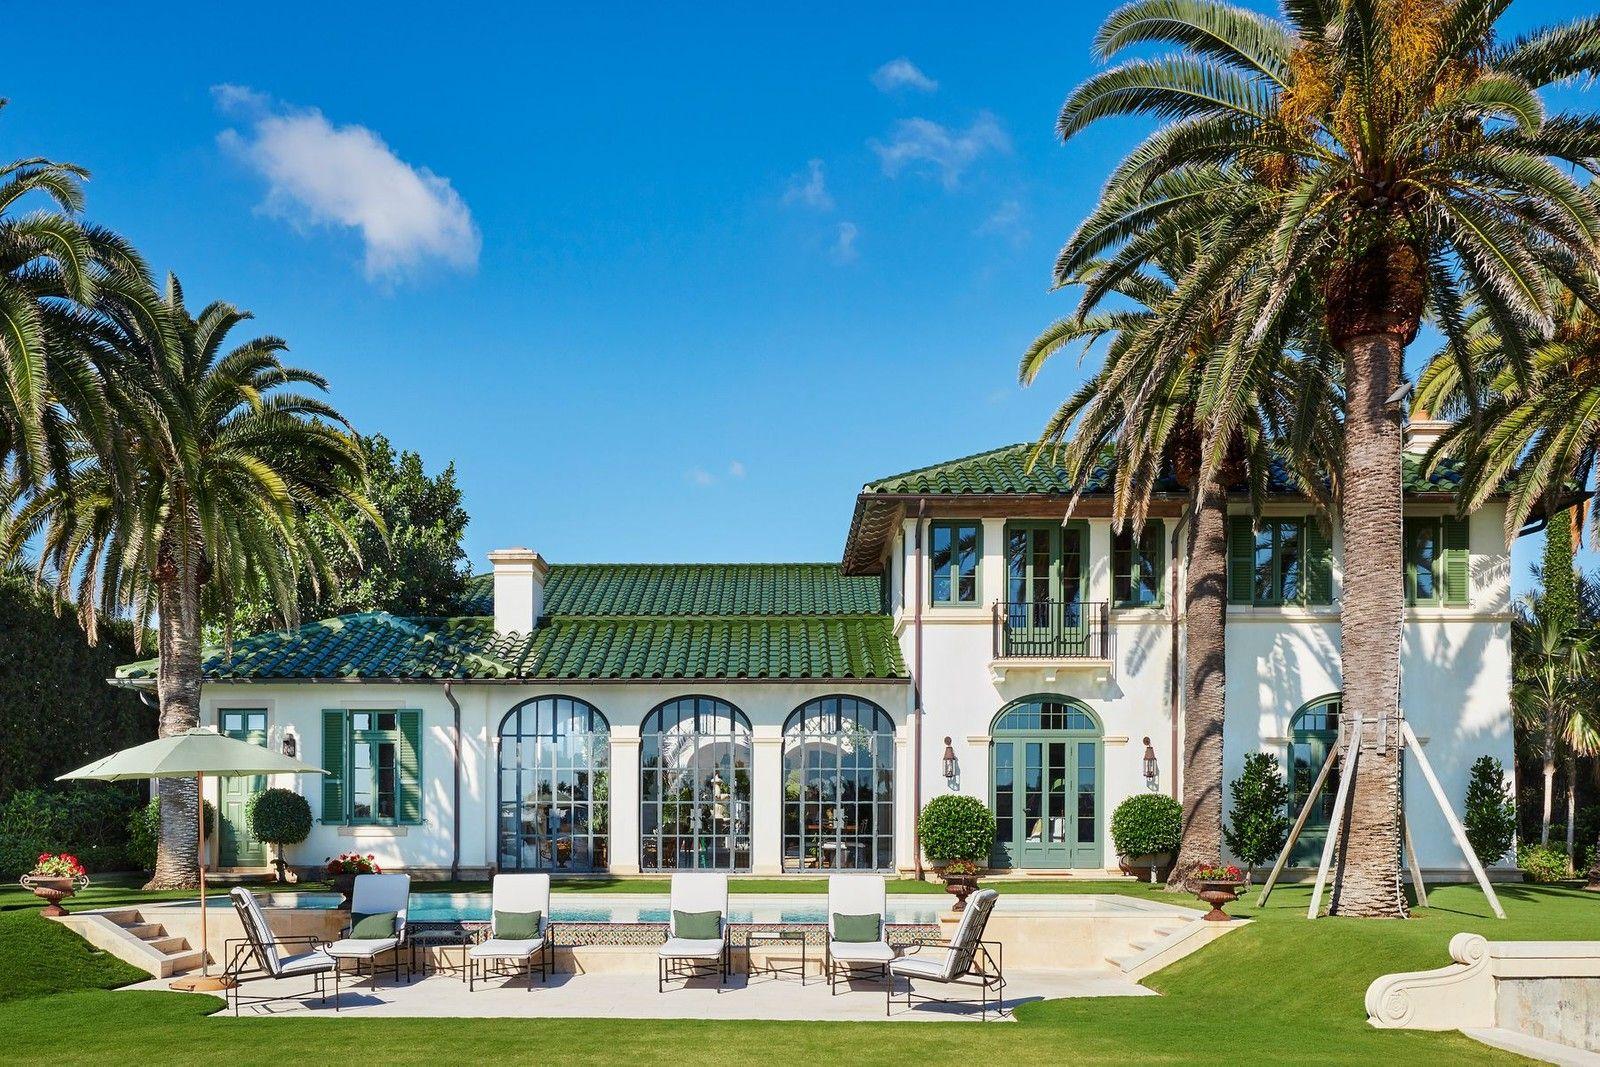 670 Island Dr Palm Beach, Florida, United States Luxury